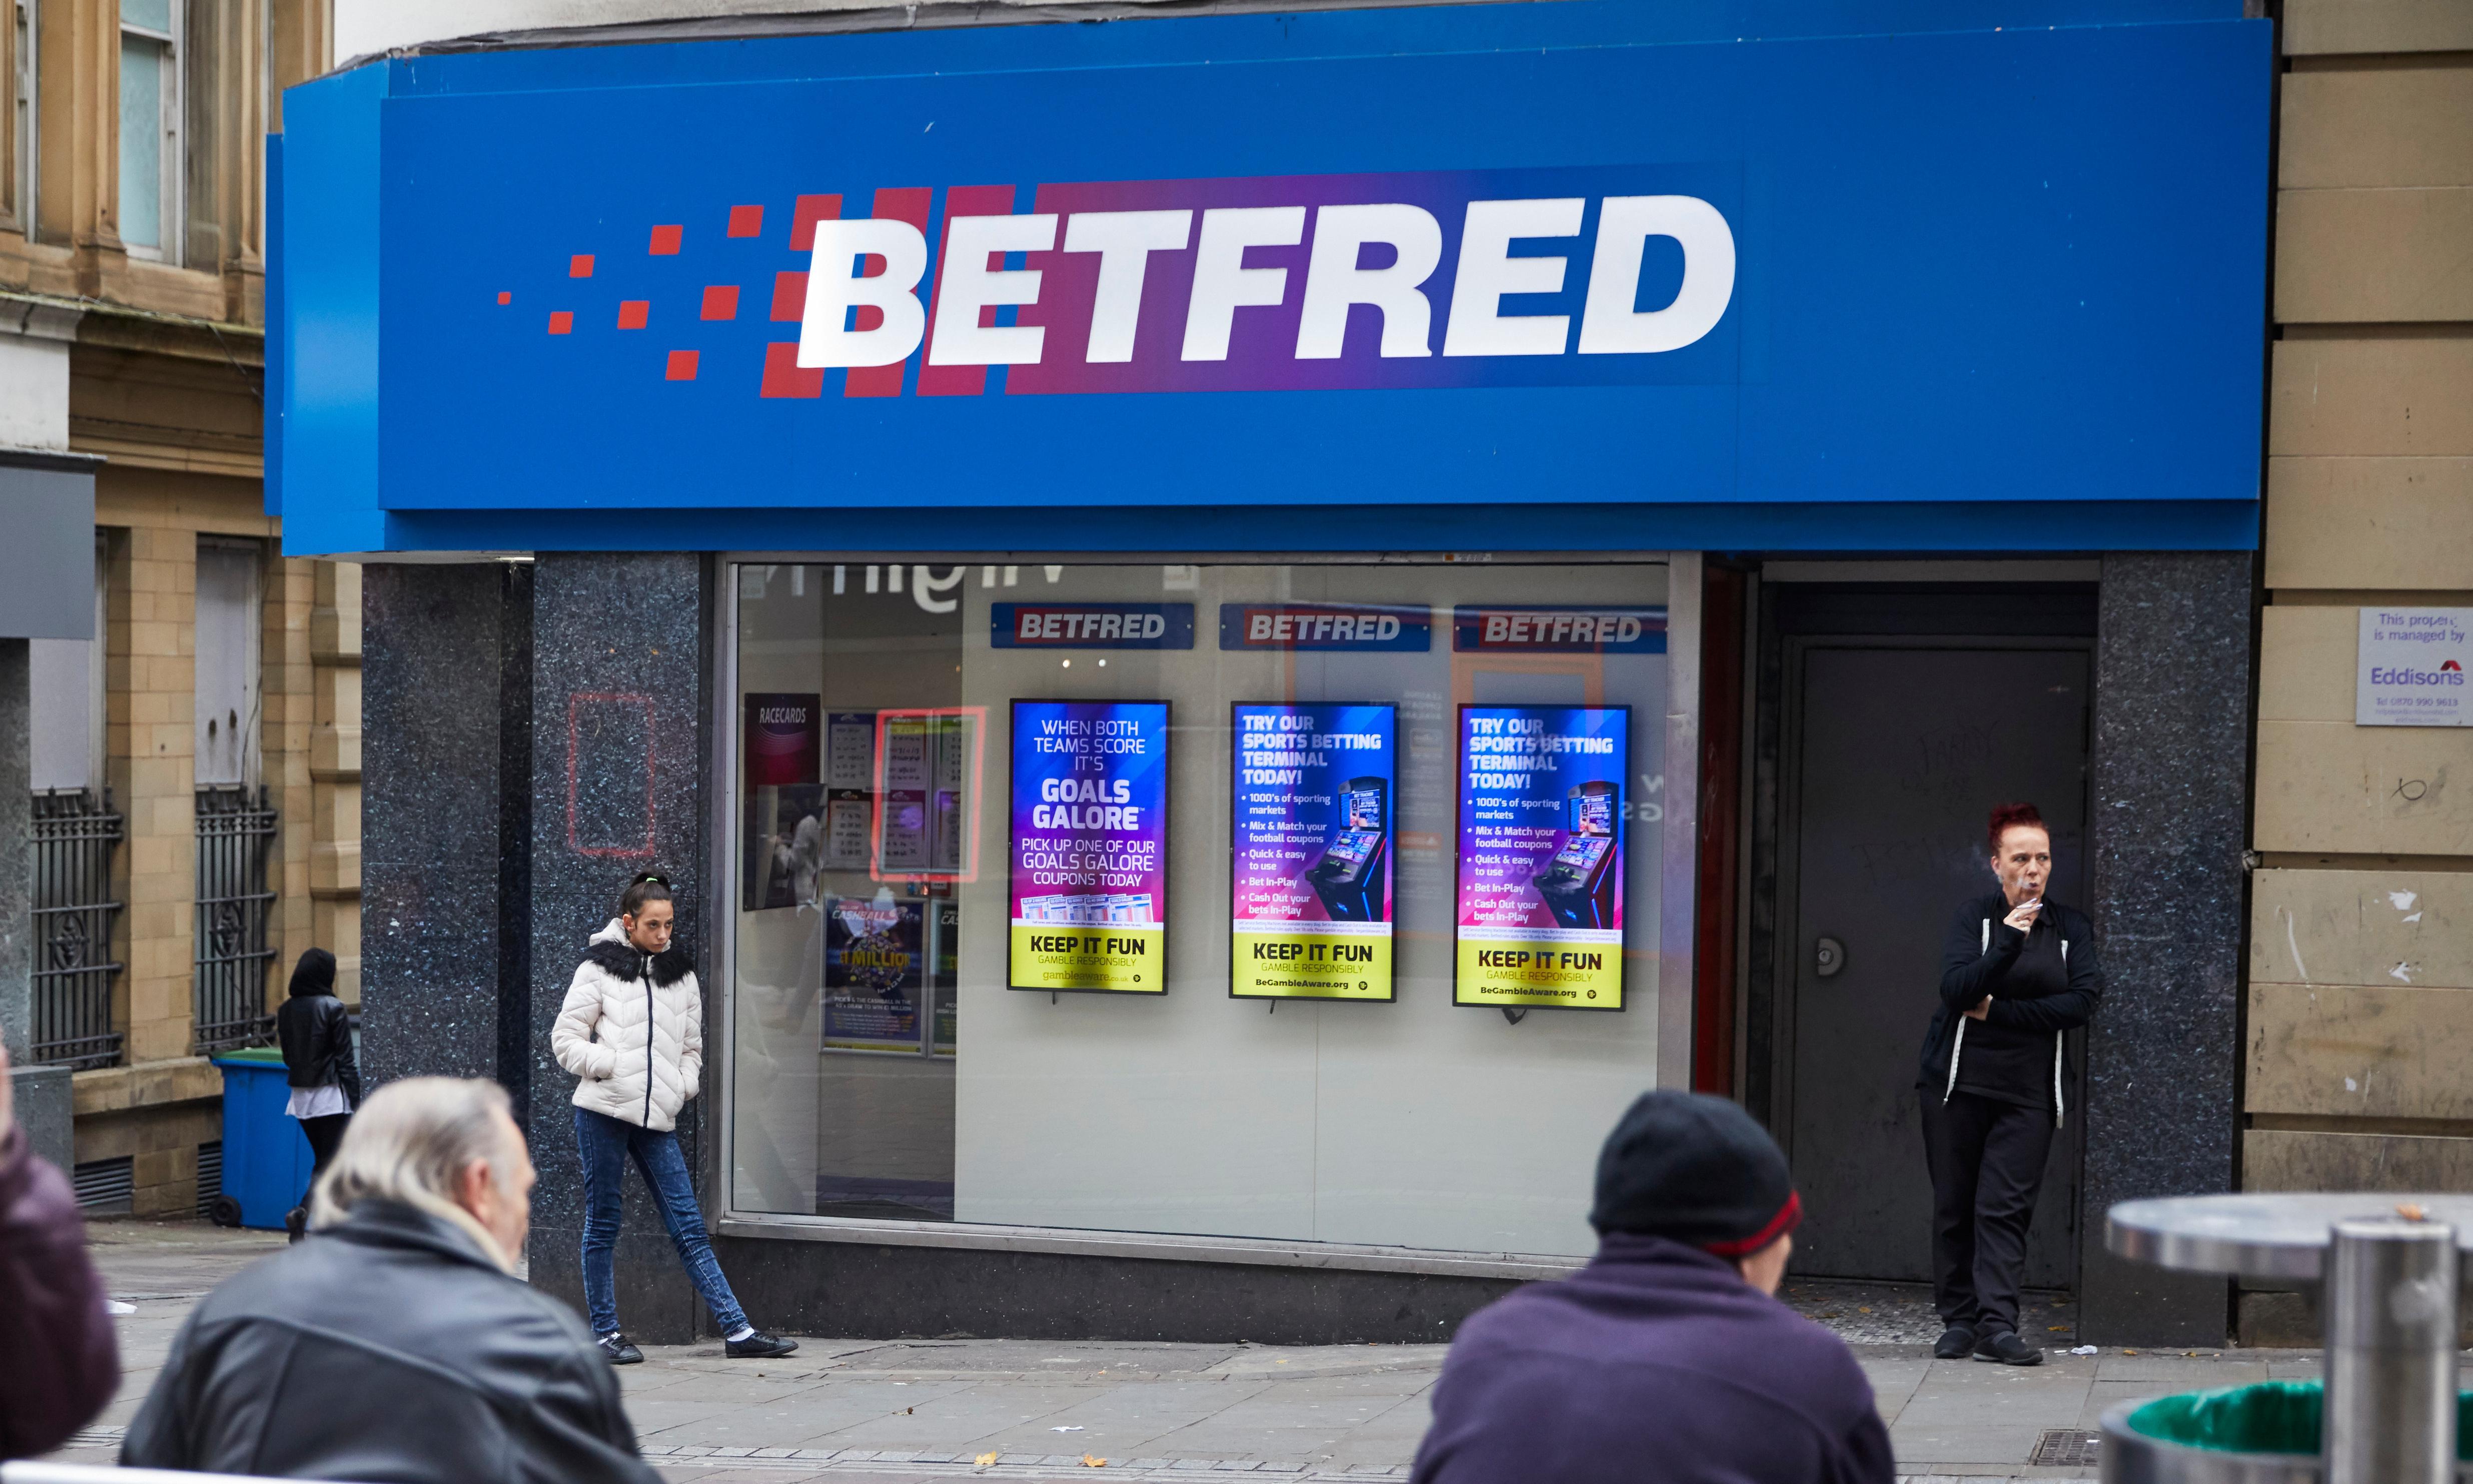 Betfred refuse punter £189,000 'winnings' after 'error' on betting slip